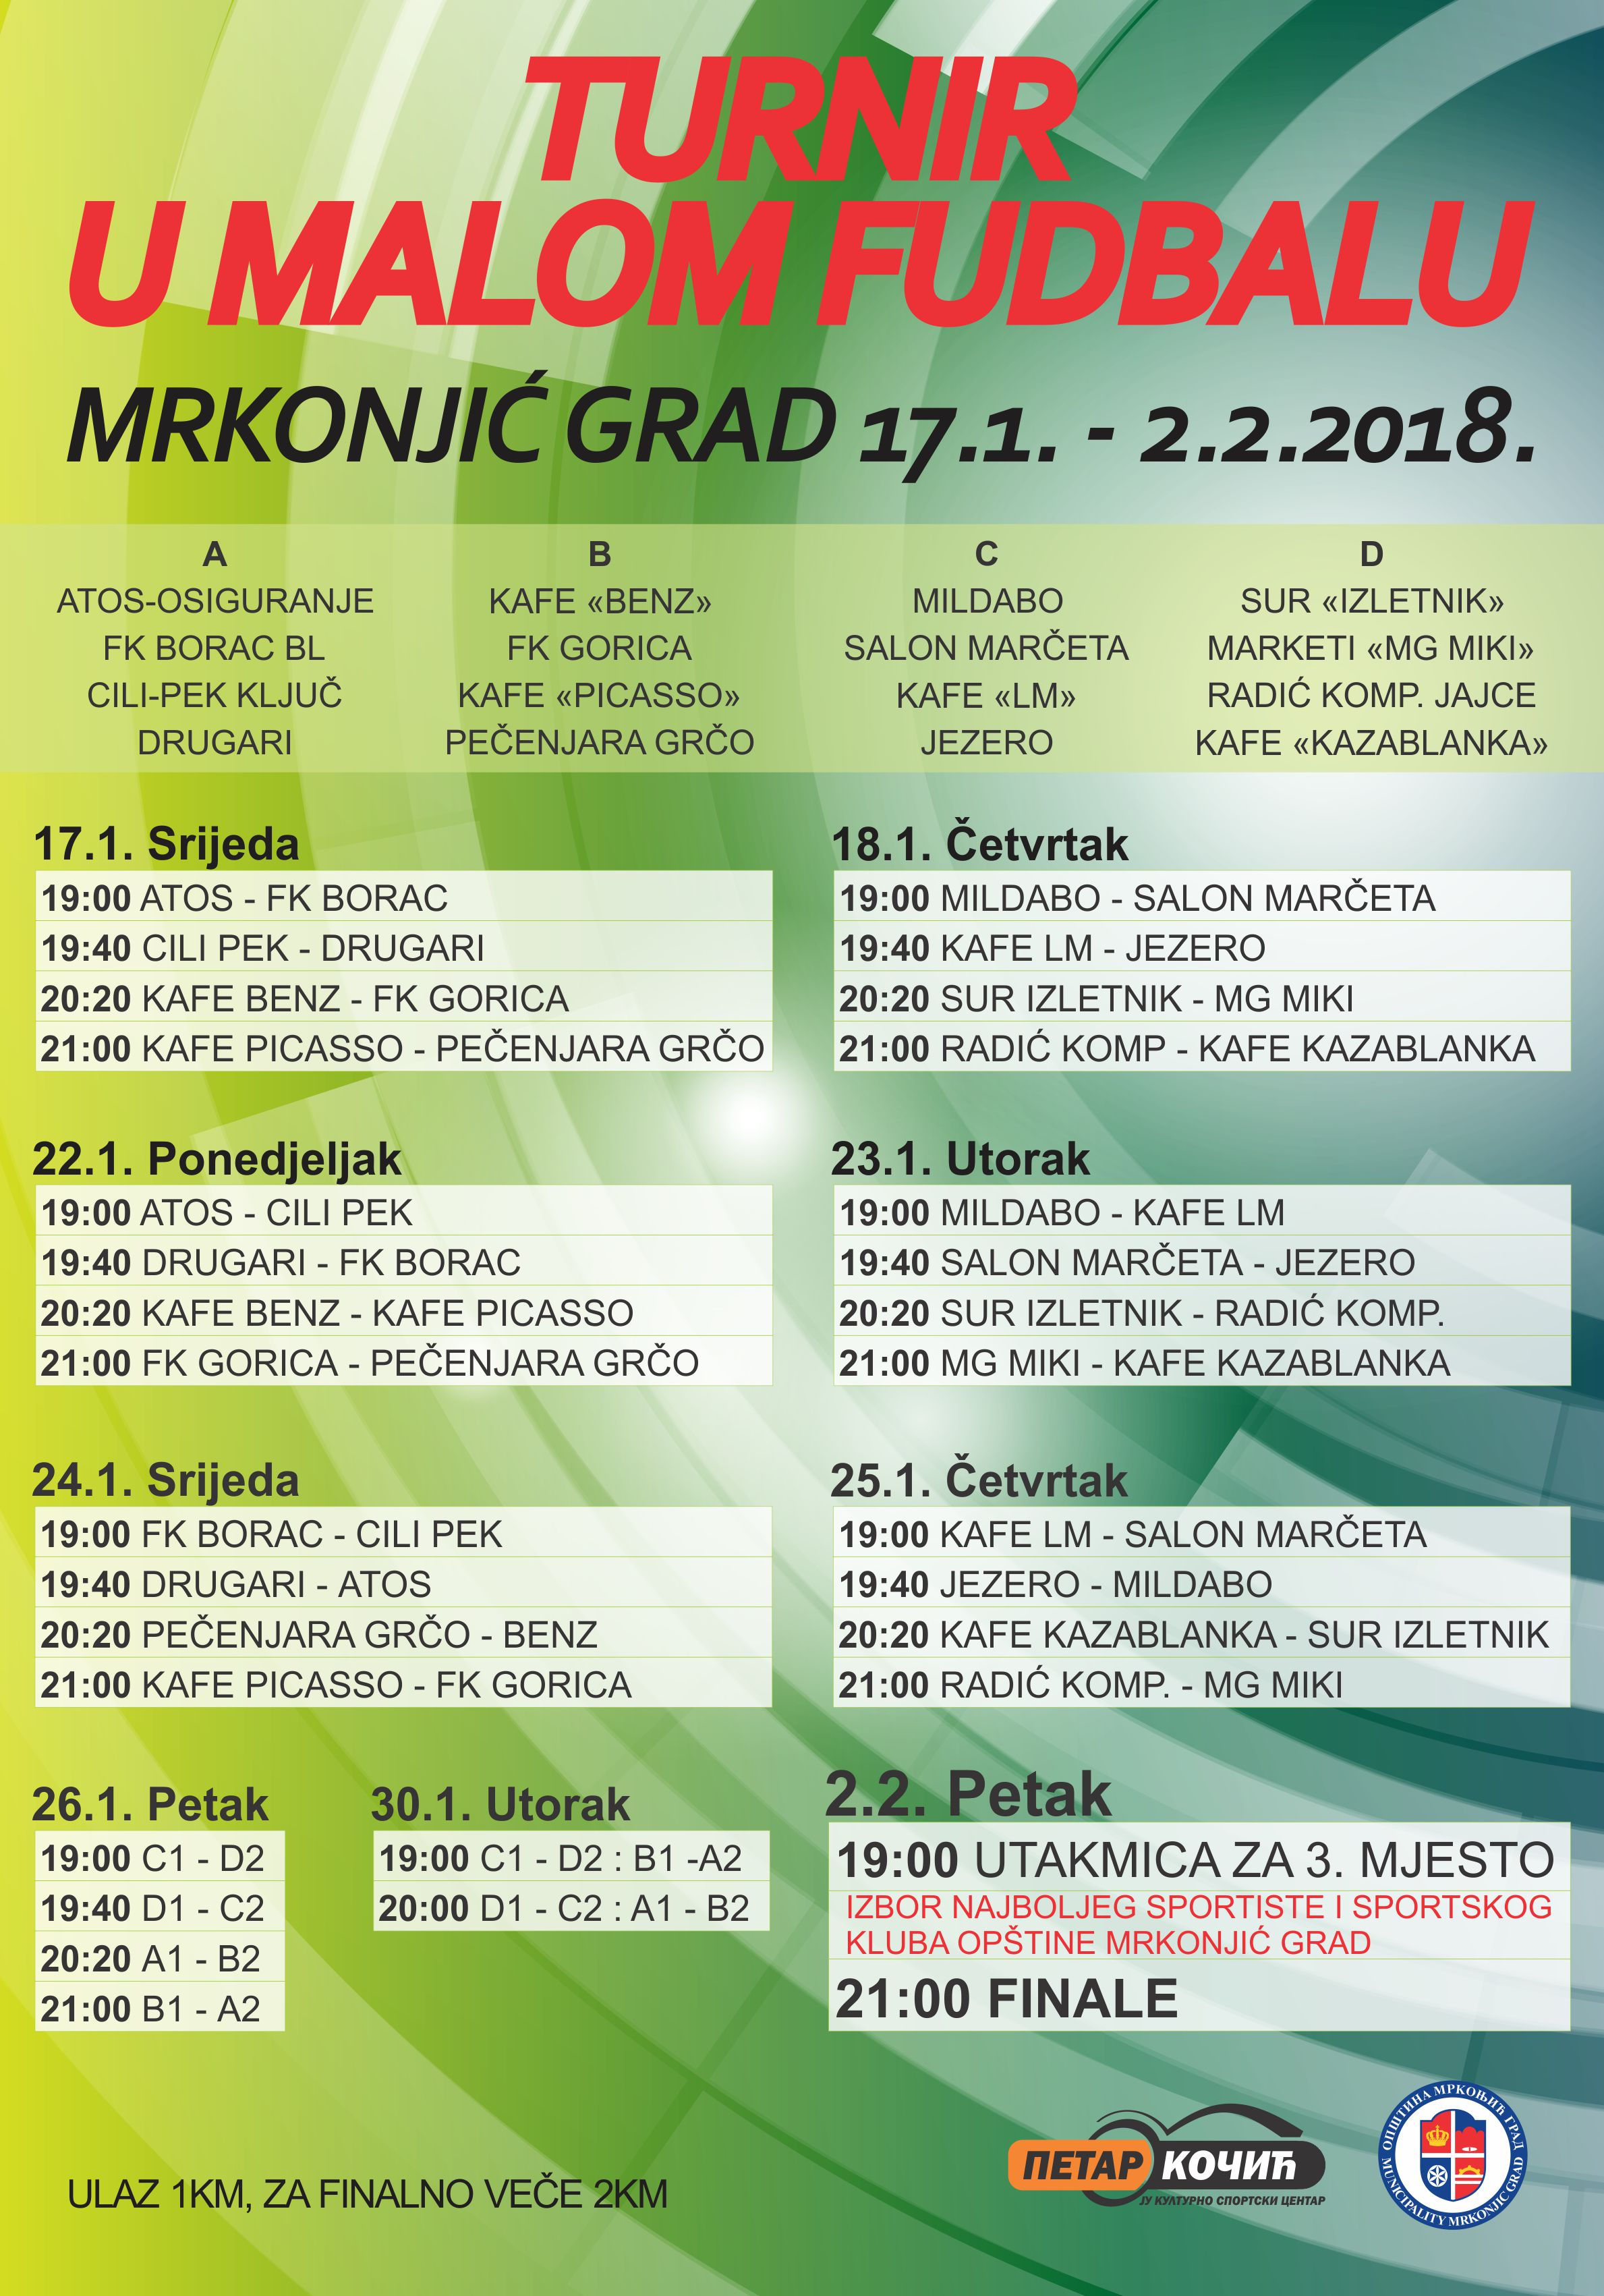 Турнир у малом фудбалу Мркоњић Град - распоред утакмица